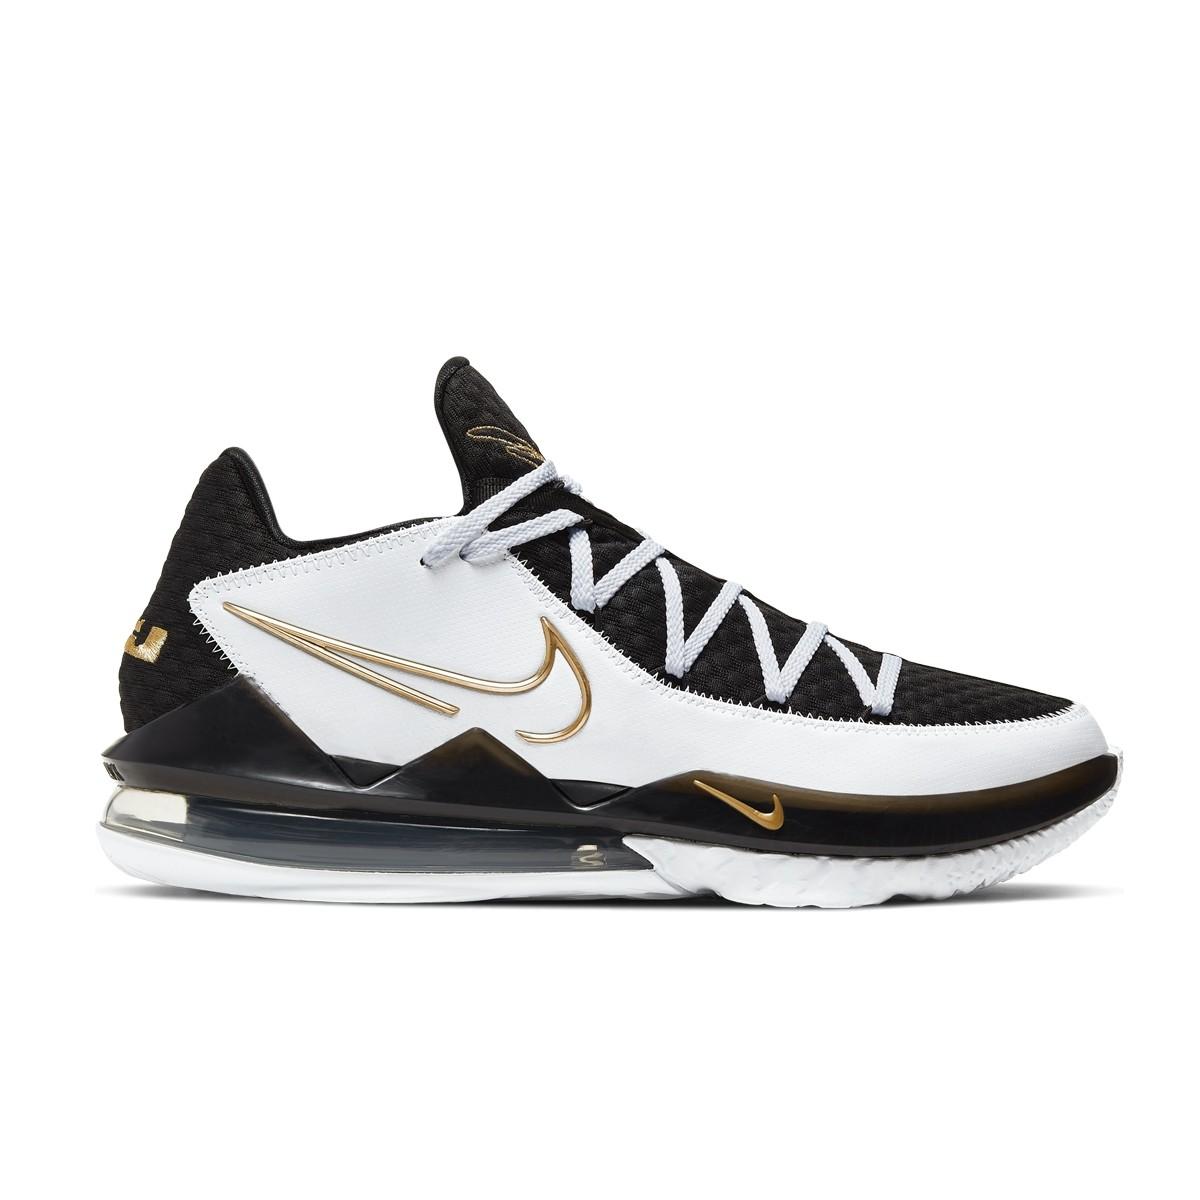 Nike Lebron XVII Low 'Metallic Gold'